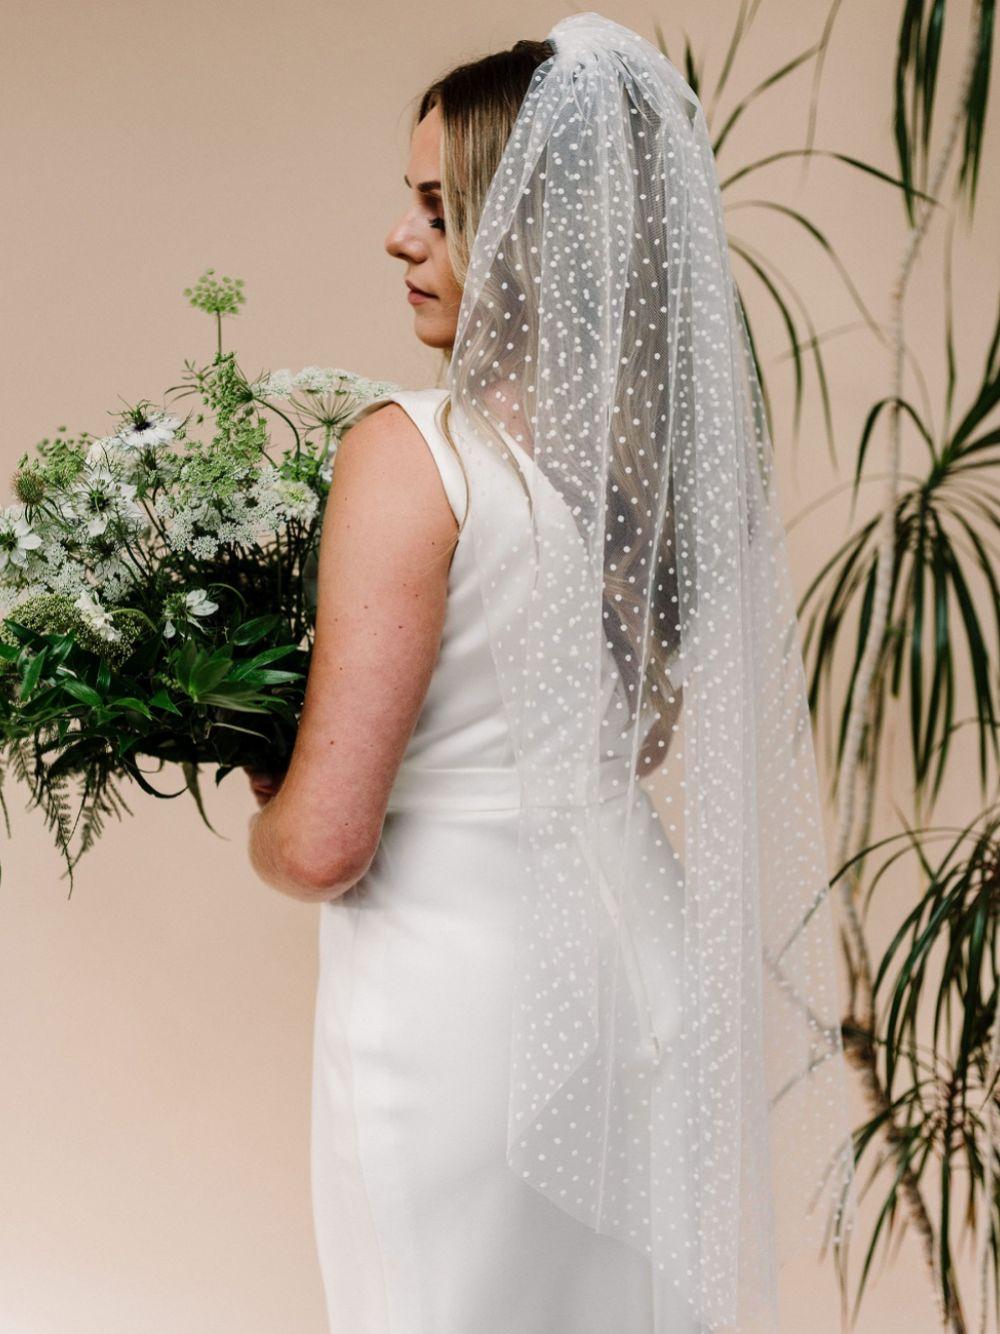 Linzi Jay Polka Dot Tulle Single Tier Bridal Veil